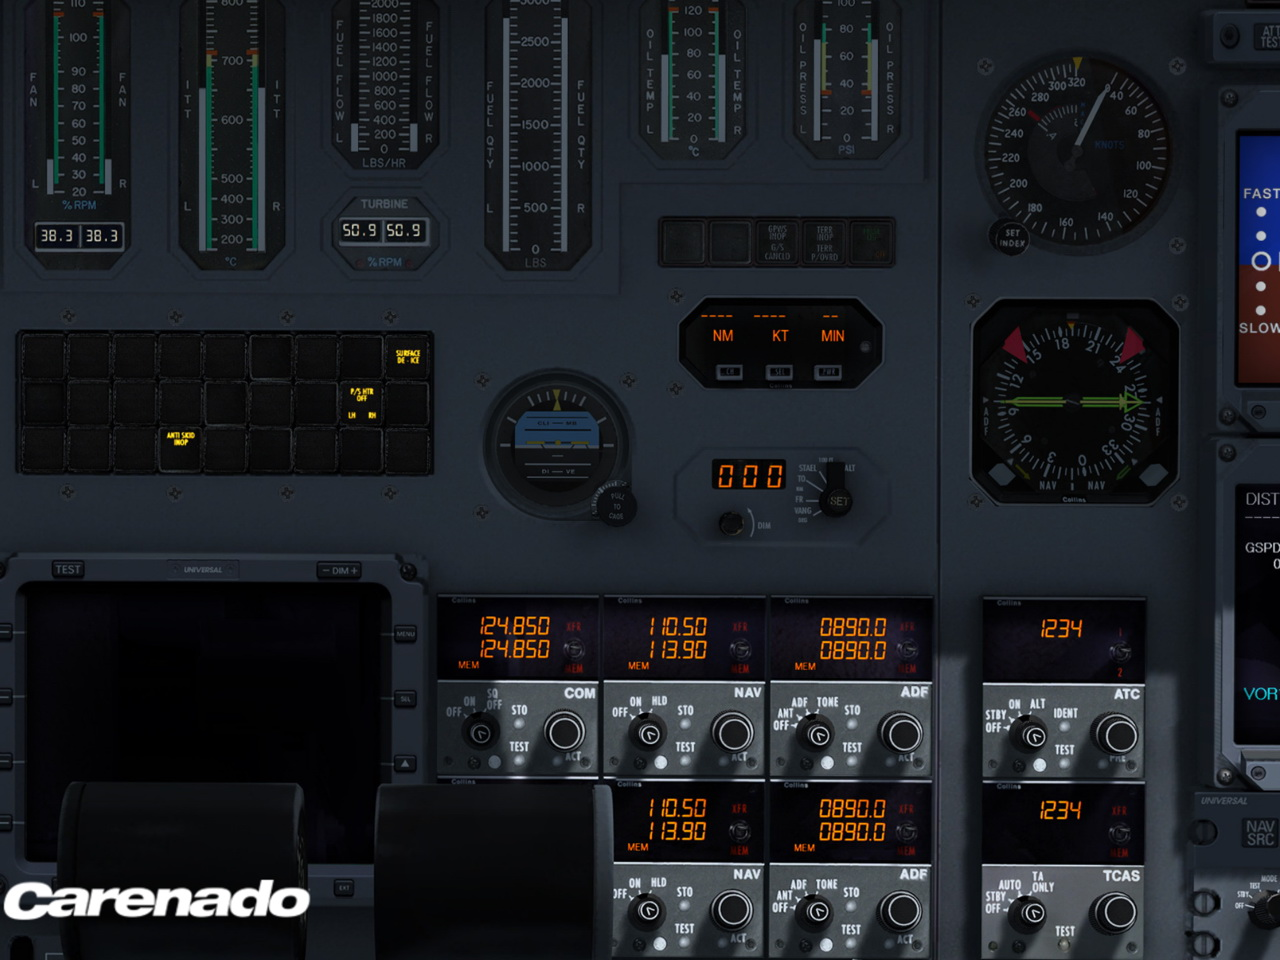 Carenado S550_5.jpg